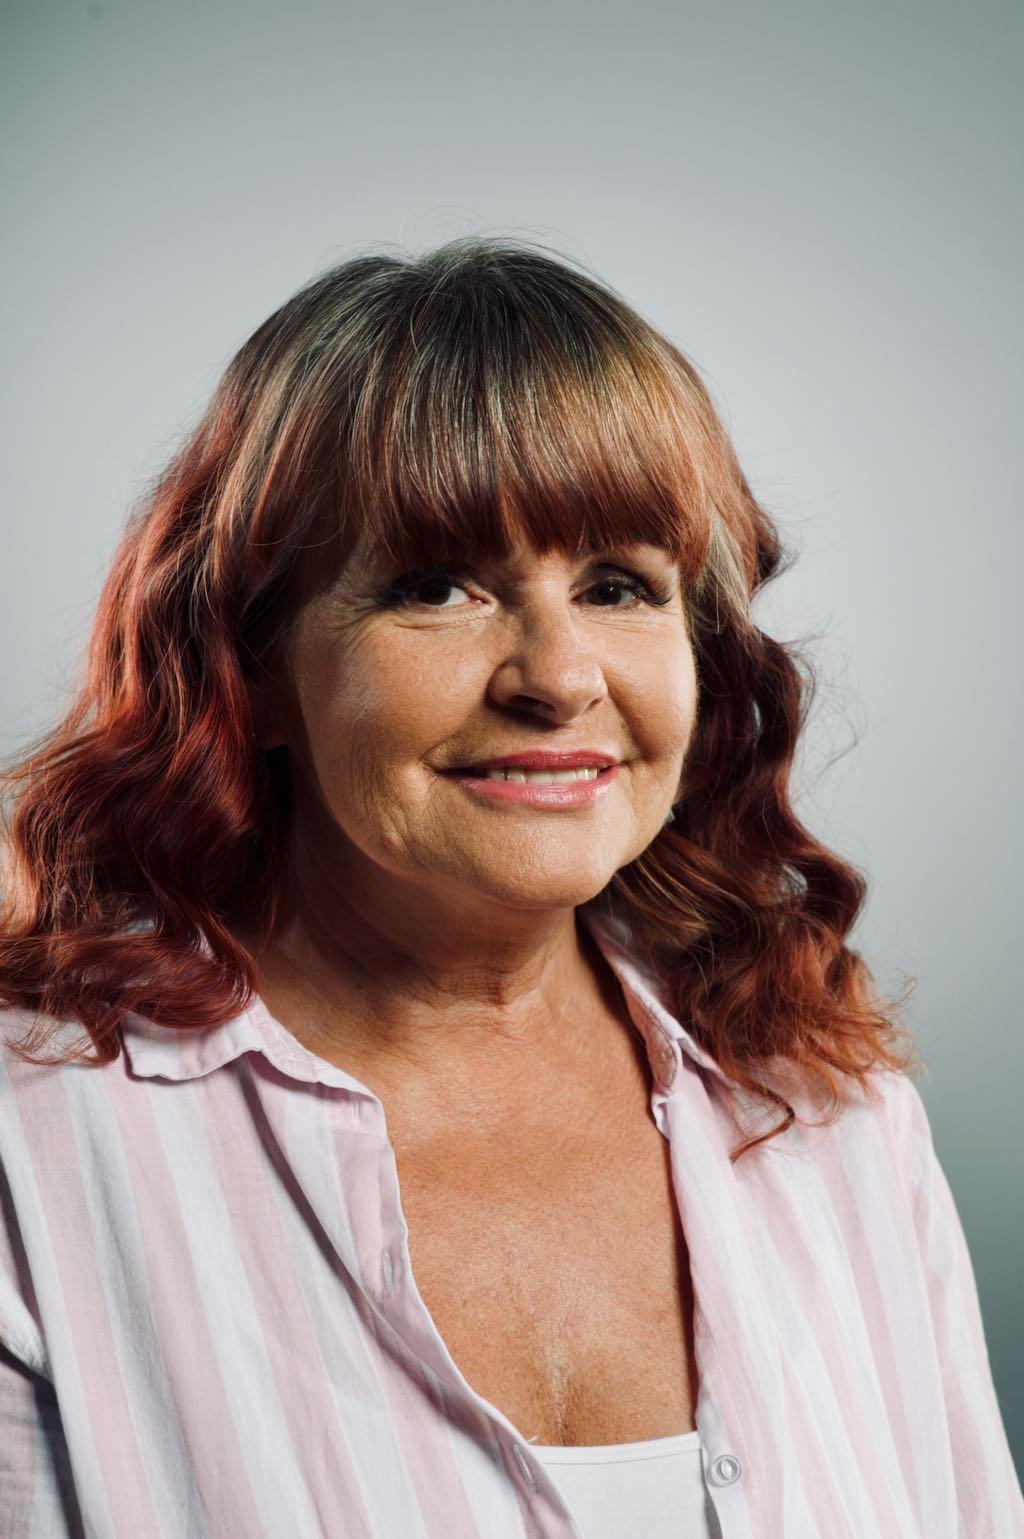 Lisa Testerin - Mitglied des Vorstands